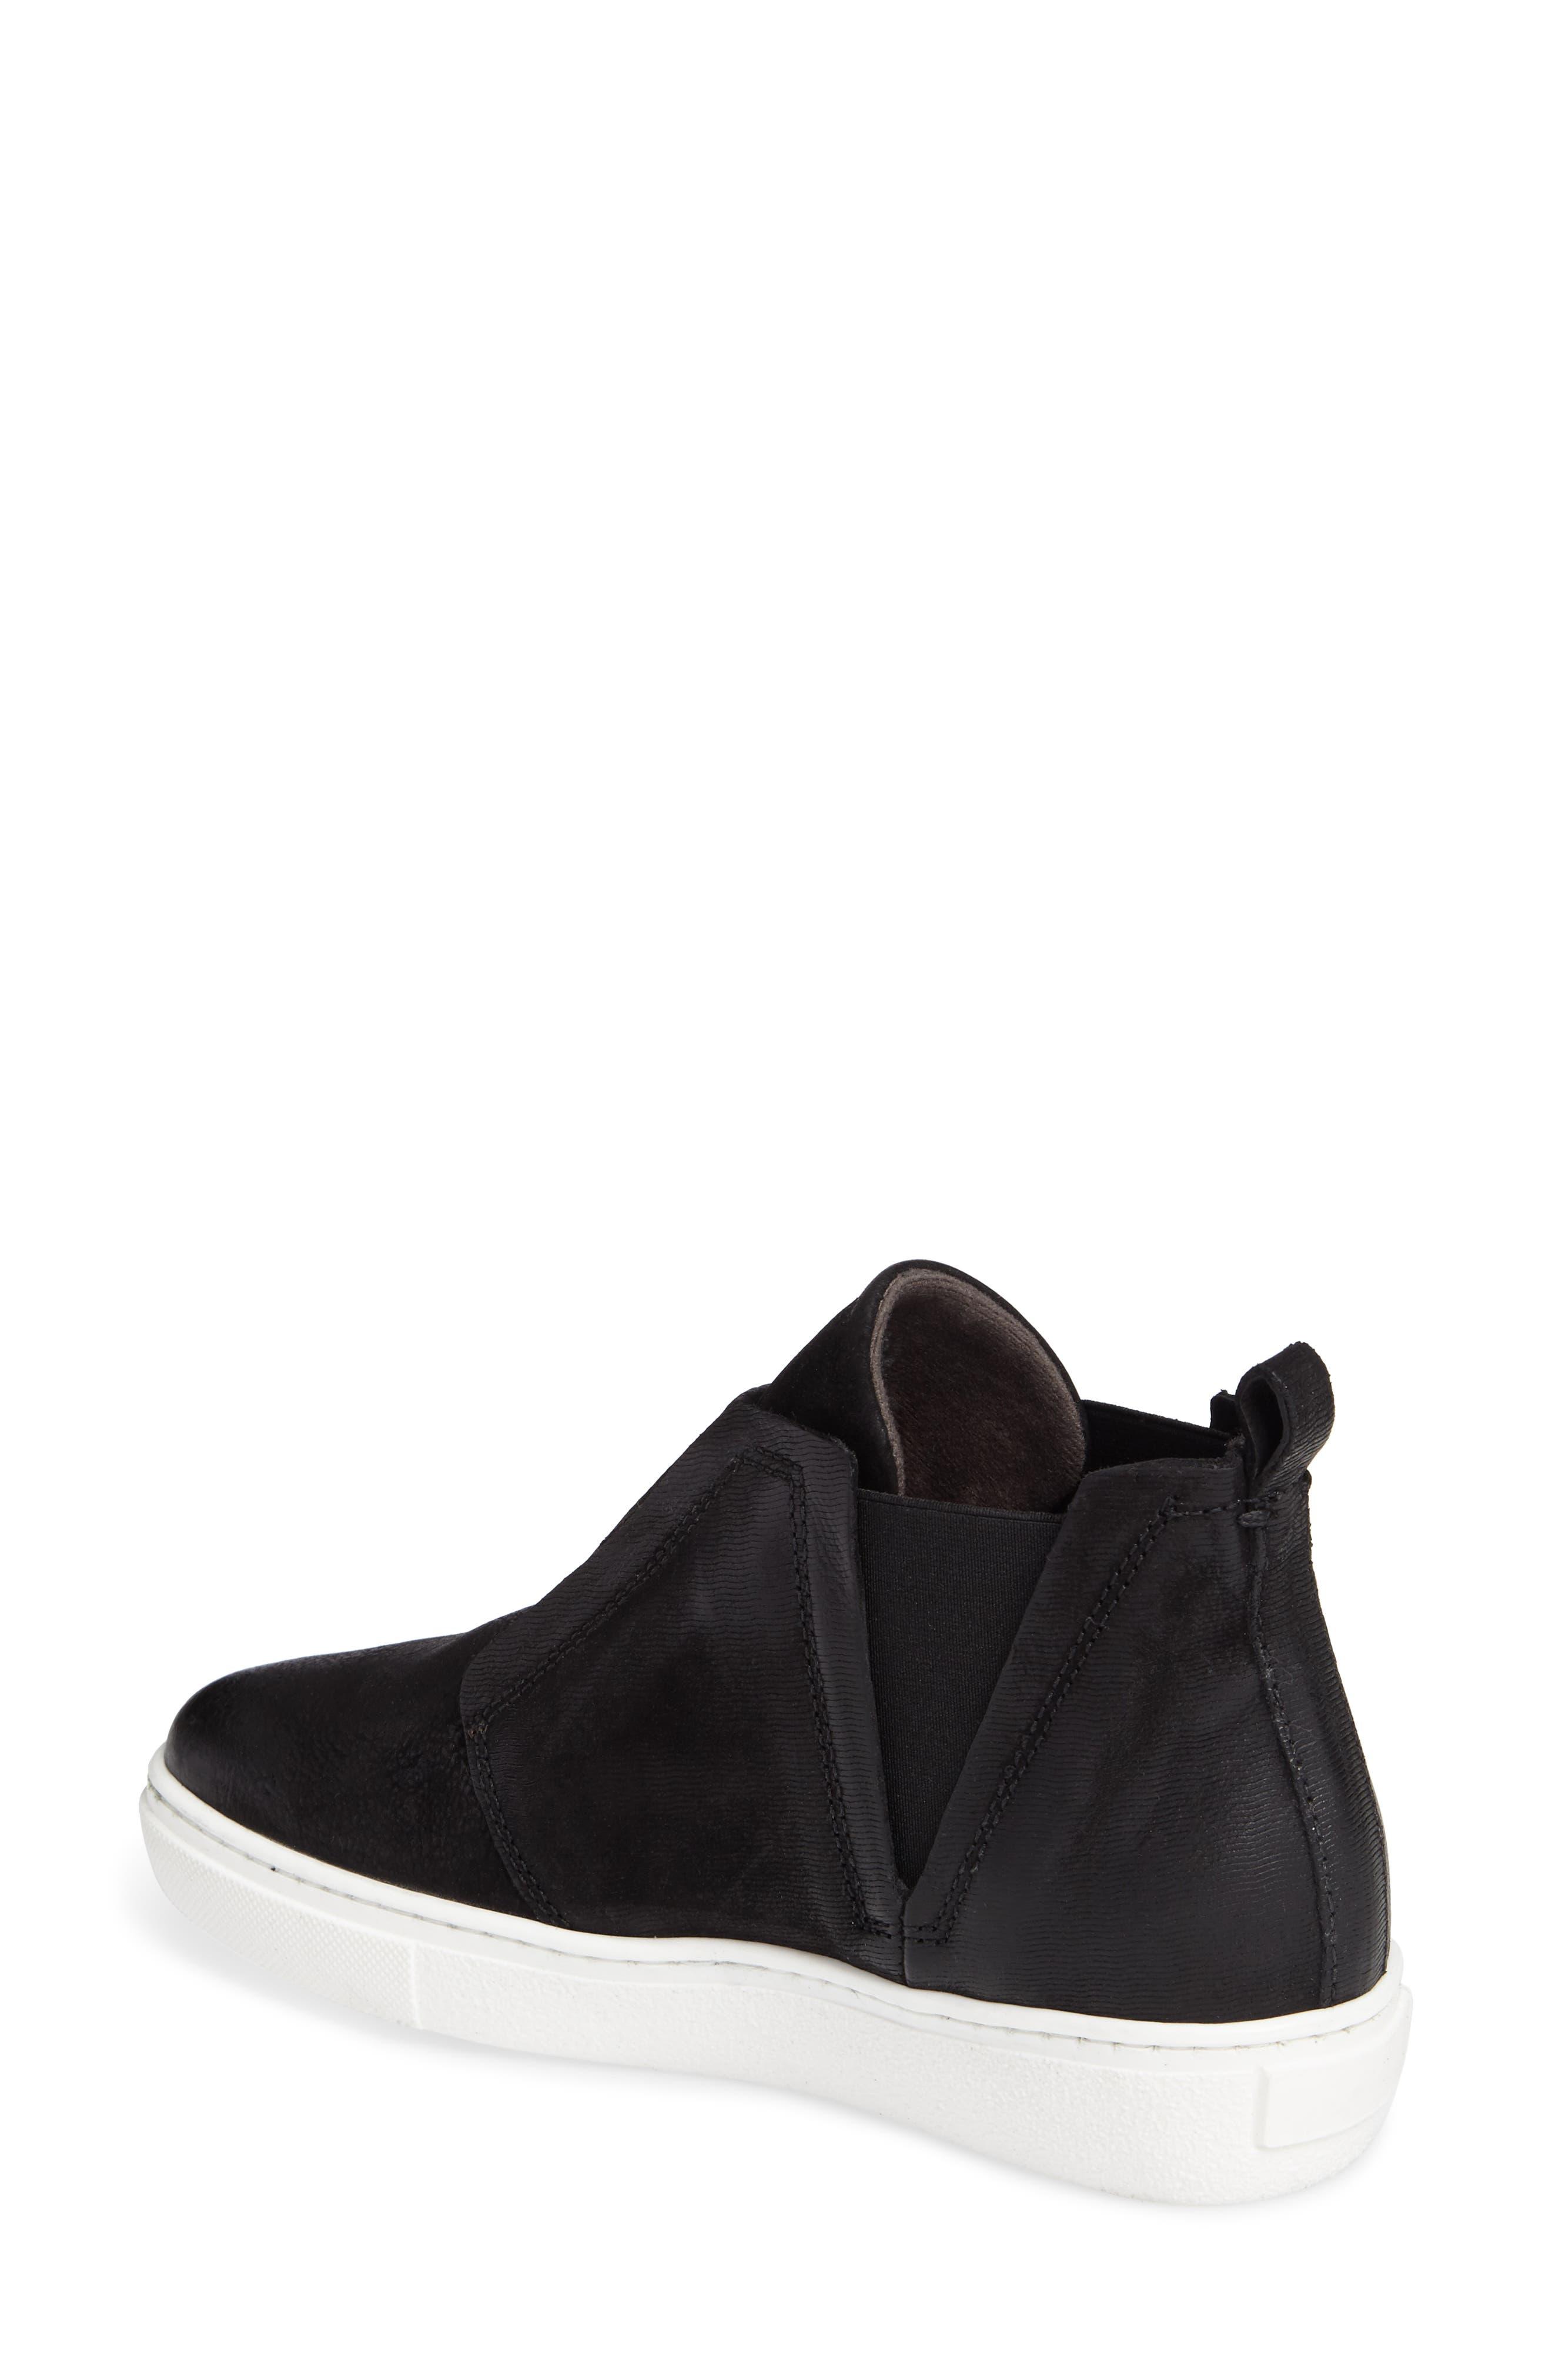 Laurent High Top Sneaker,                             Alternate thumbnail 2, color,                             Black